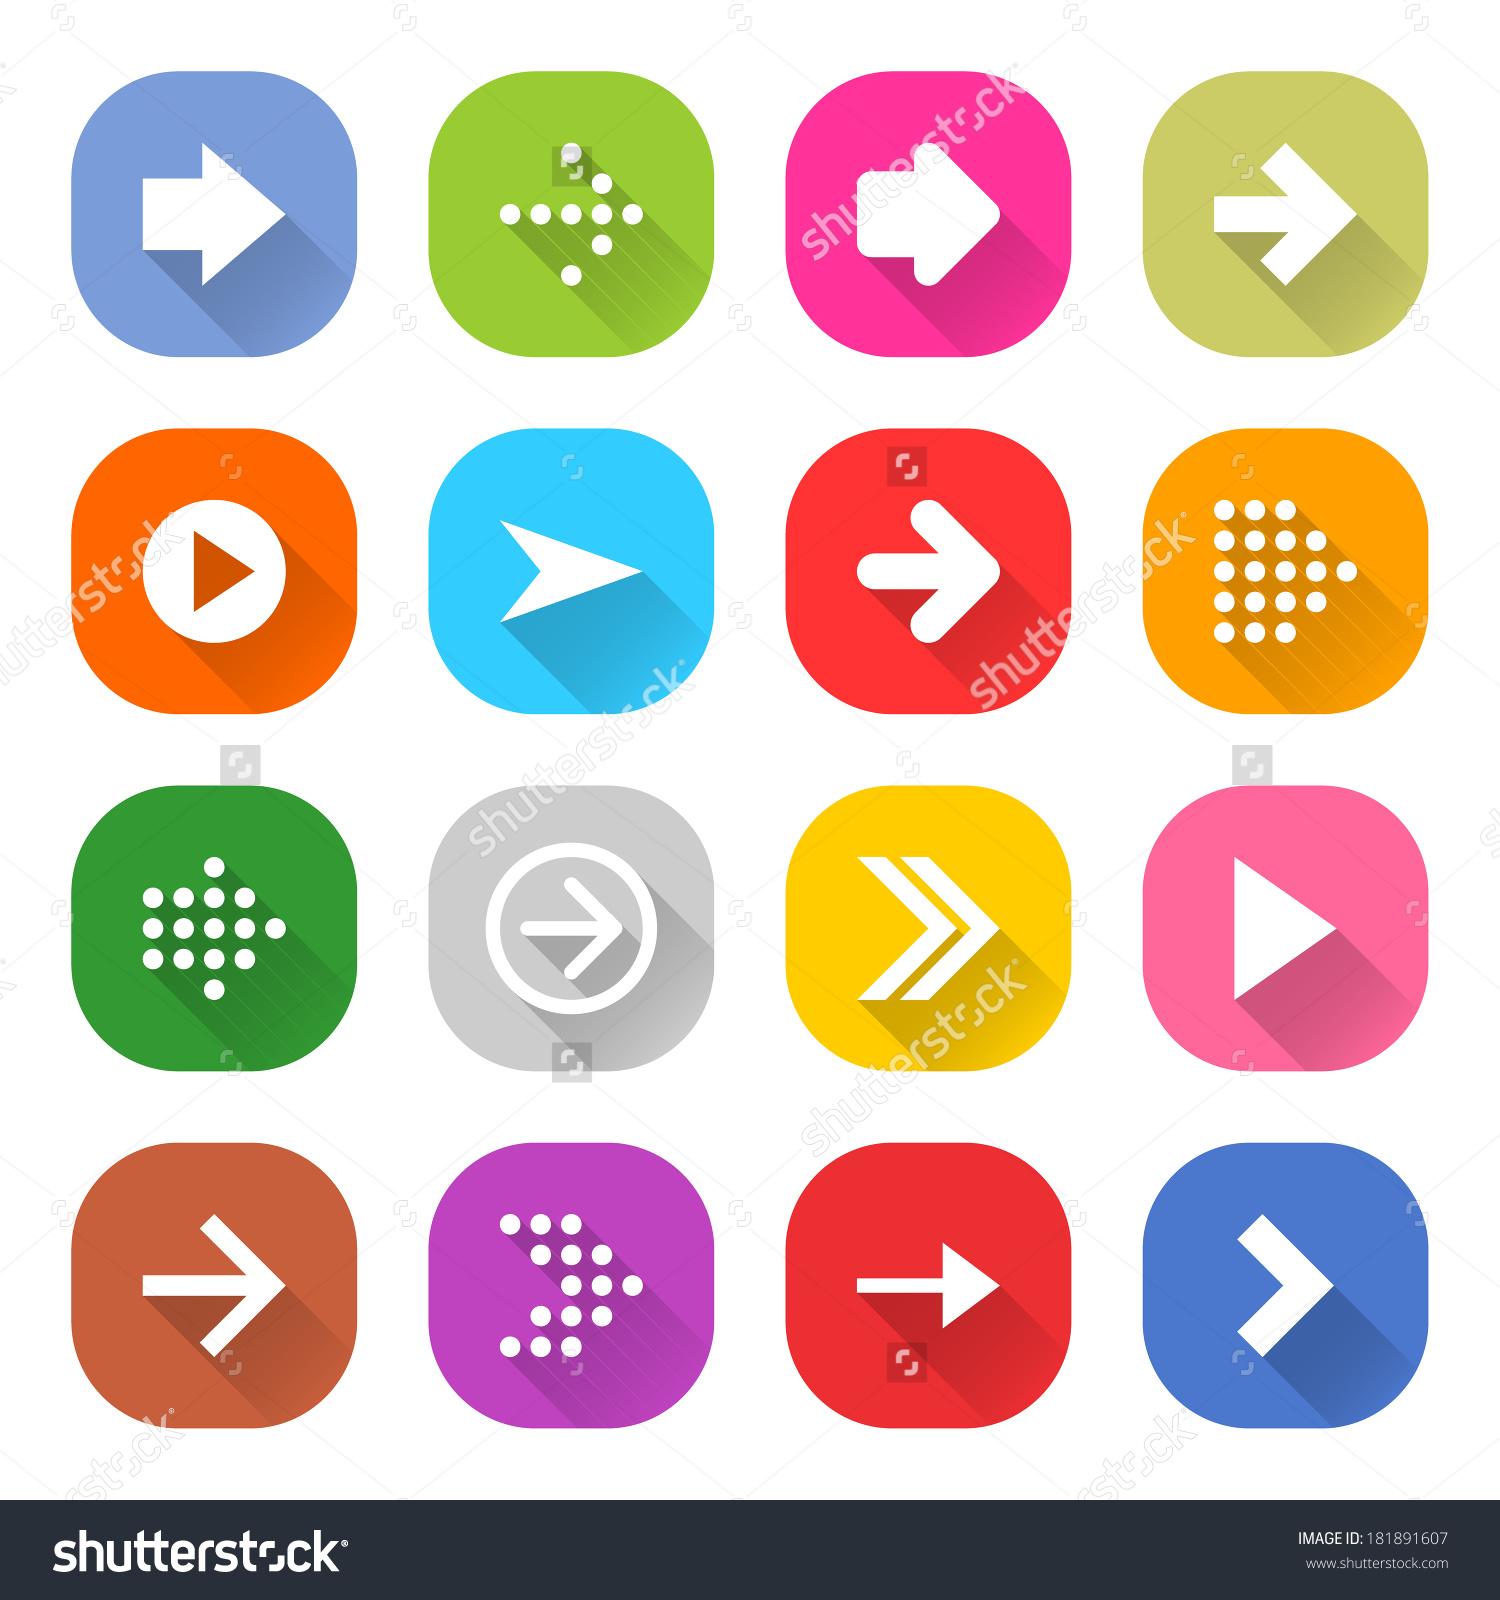 Solid color round edge square clipart free.